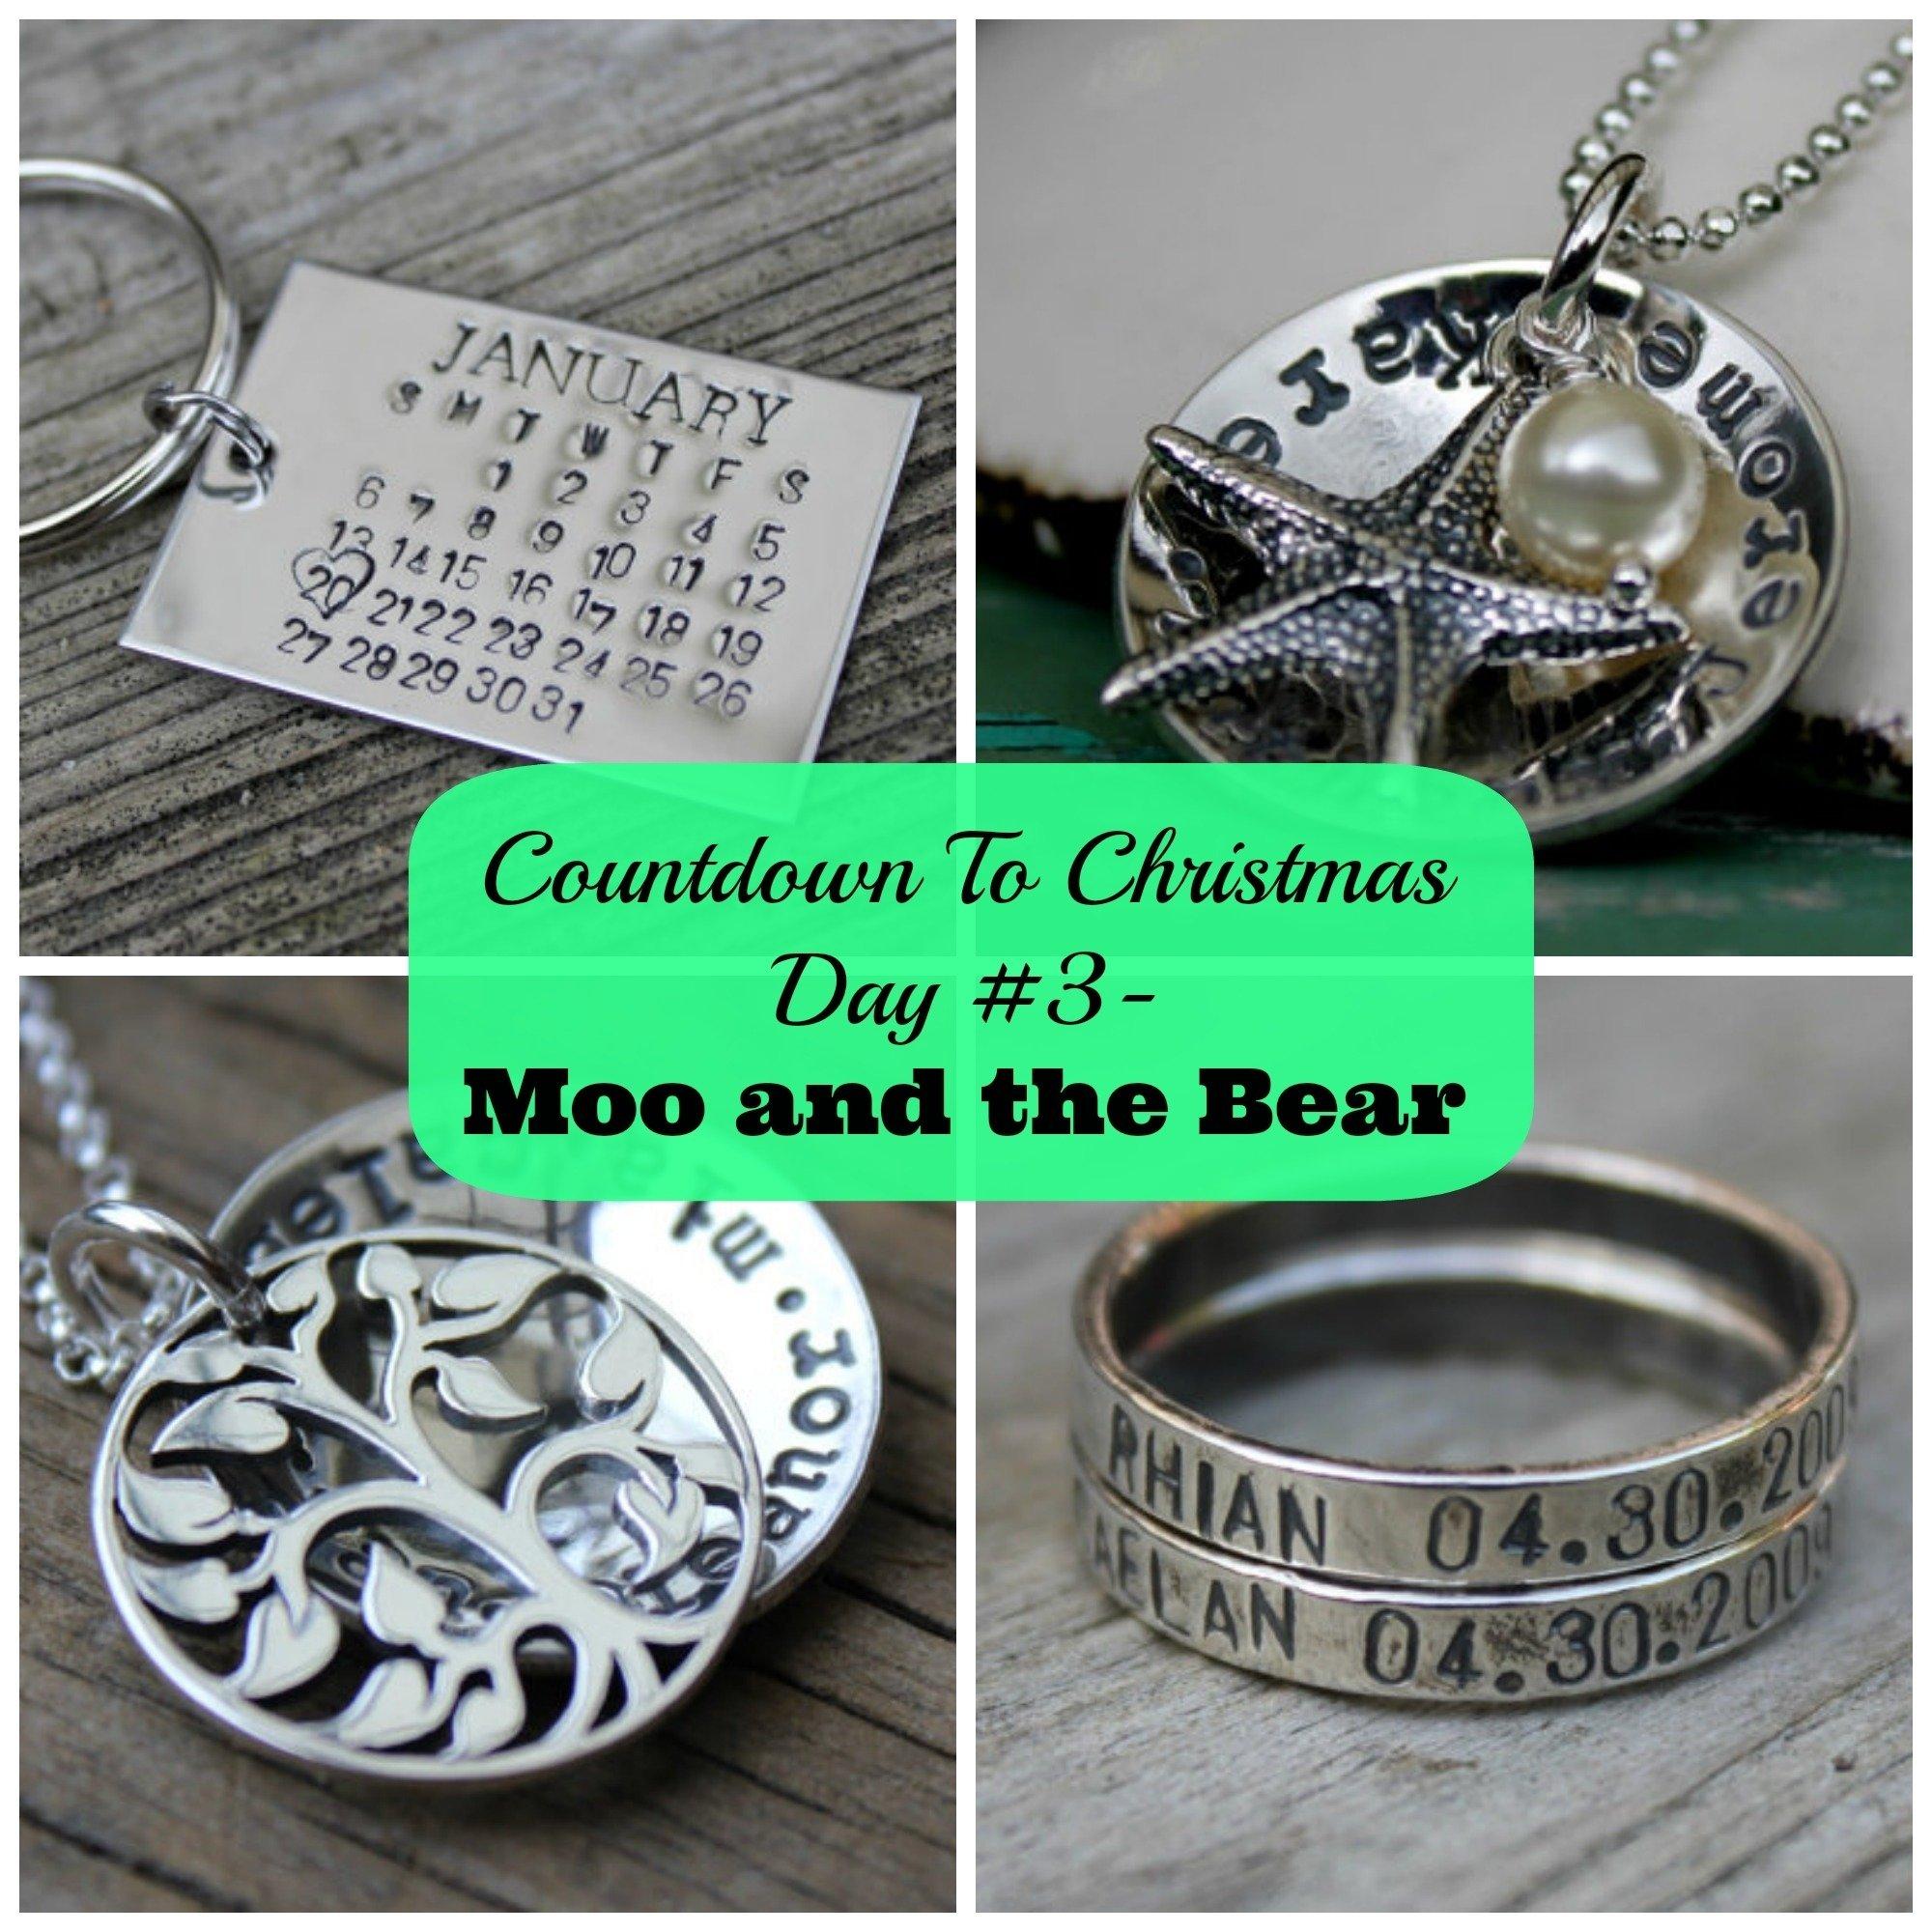 10 Elegant Christmas Present Ideas For Boyfriend gift ideas for boyfriend free gift ideas for boyfriend christmas